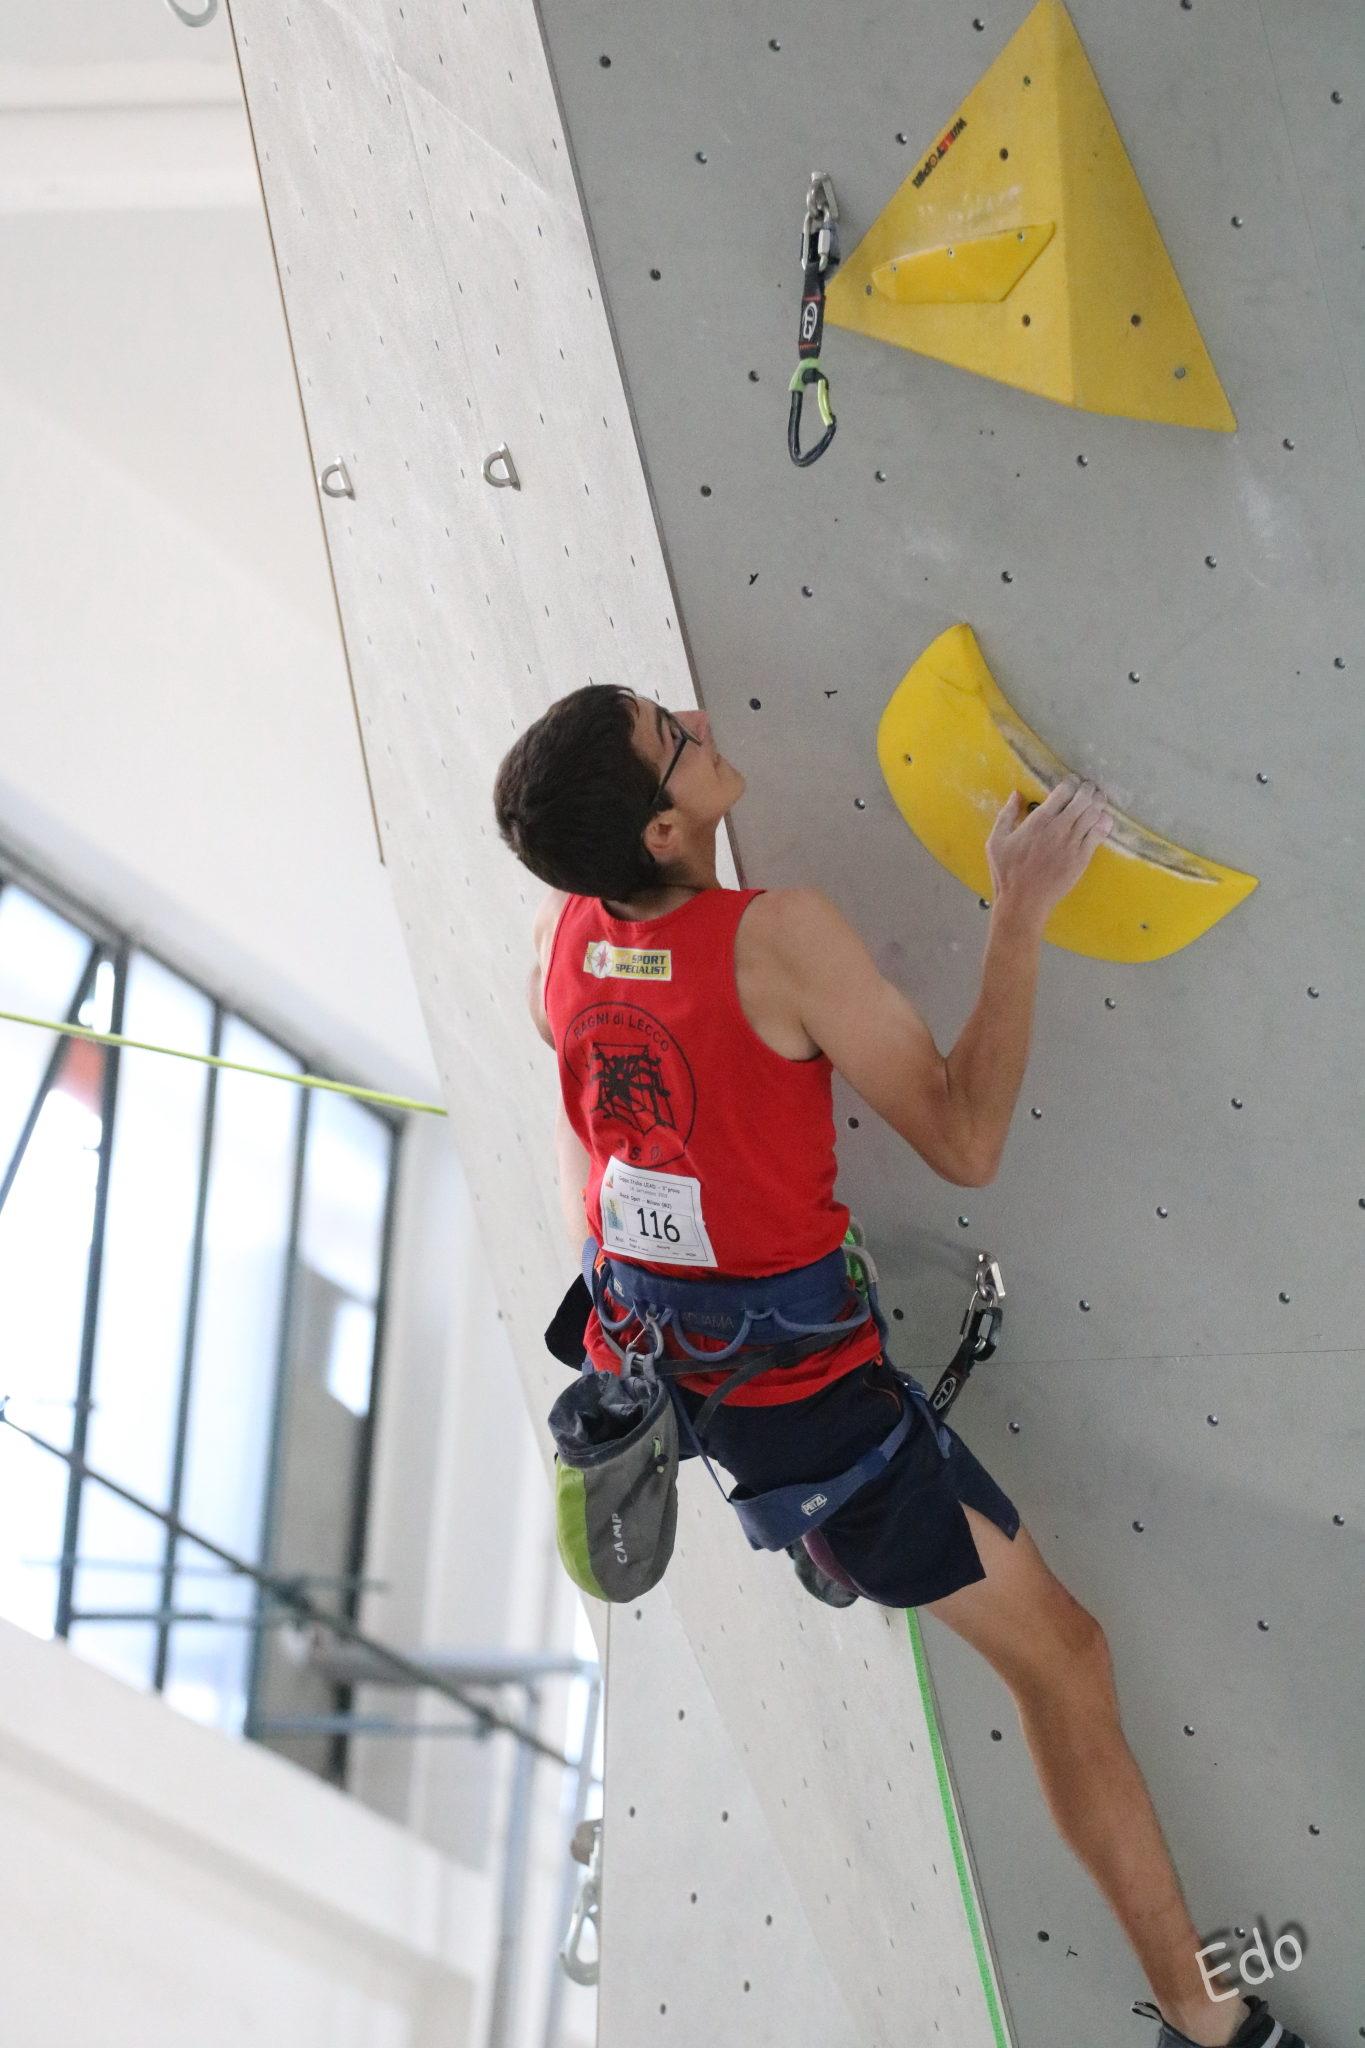 Marco Meinardi